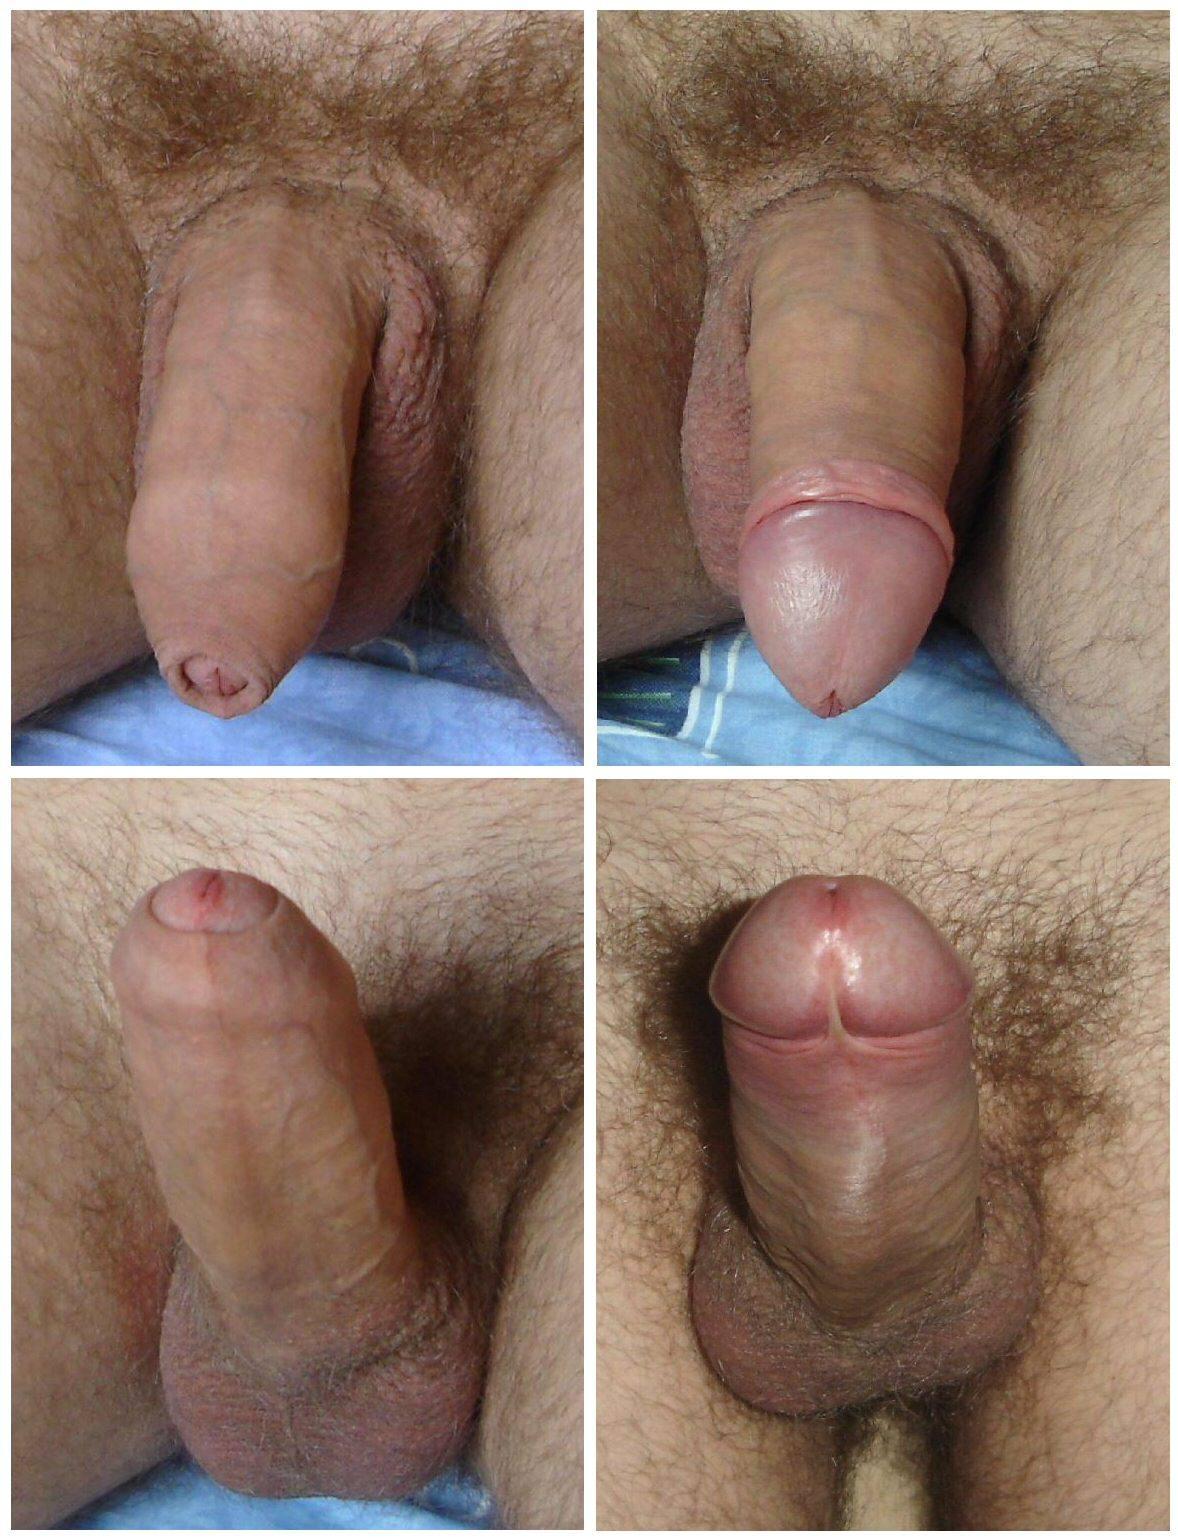 Snowwhite Gives An Uncircumcised Cock A Crazy Blowjob